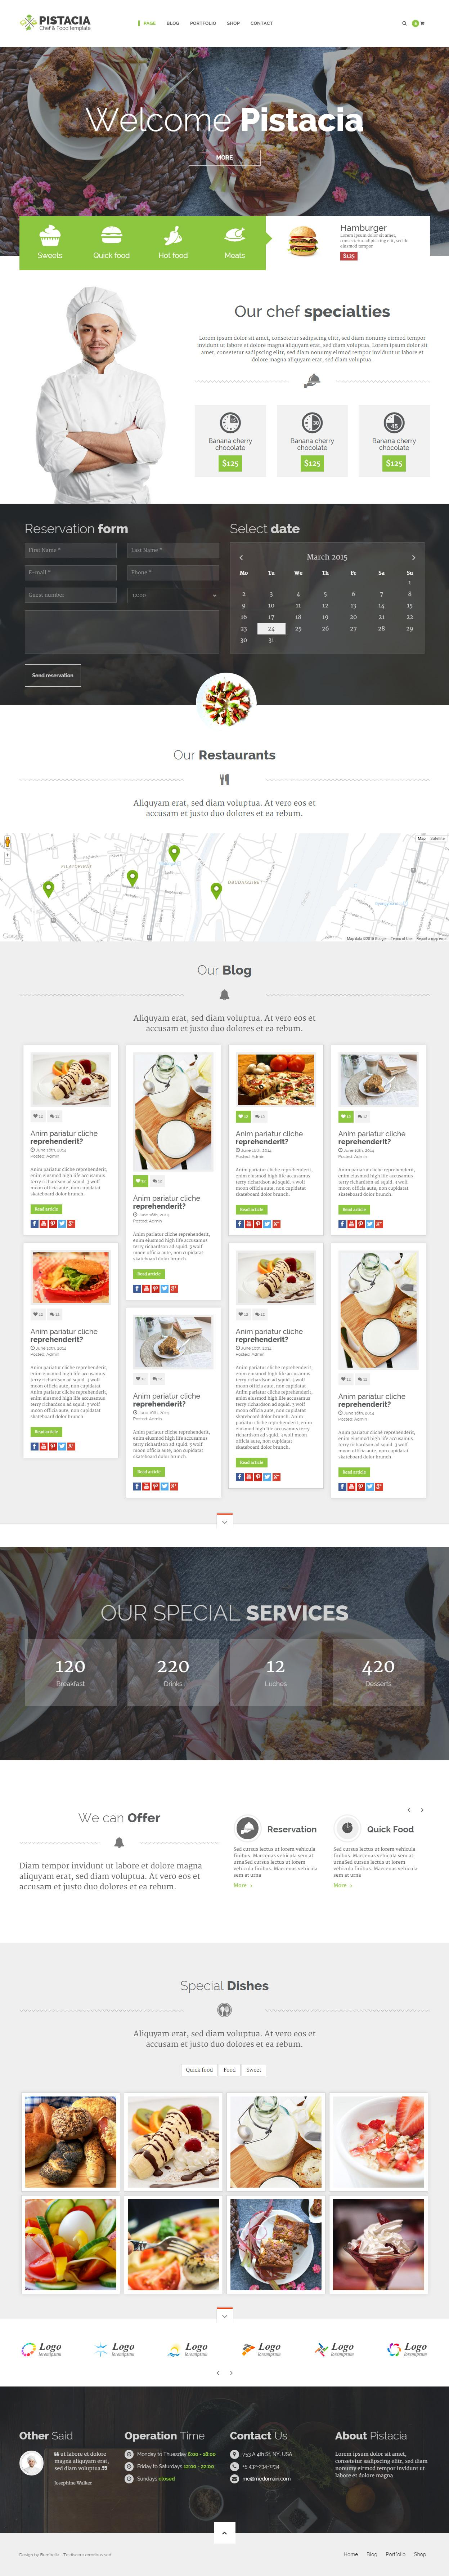 Food Website Templates Html5